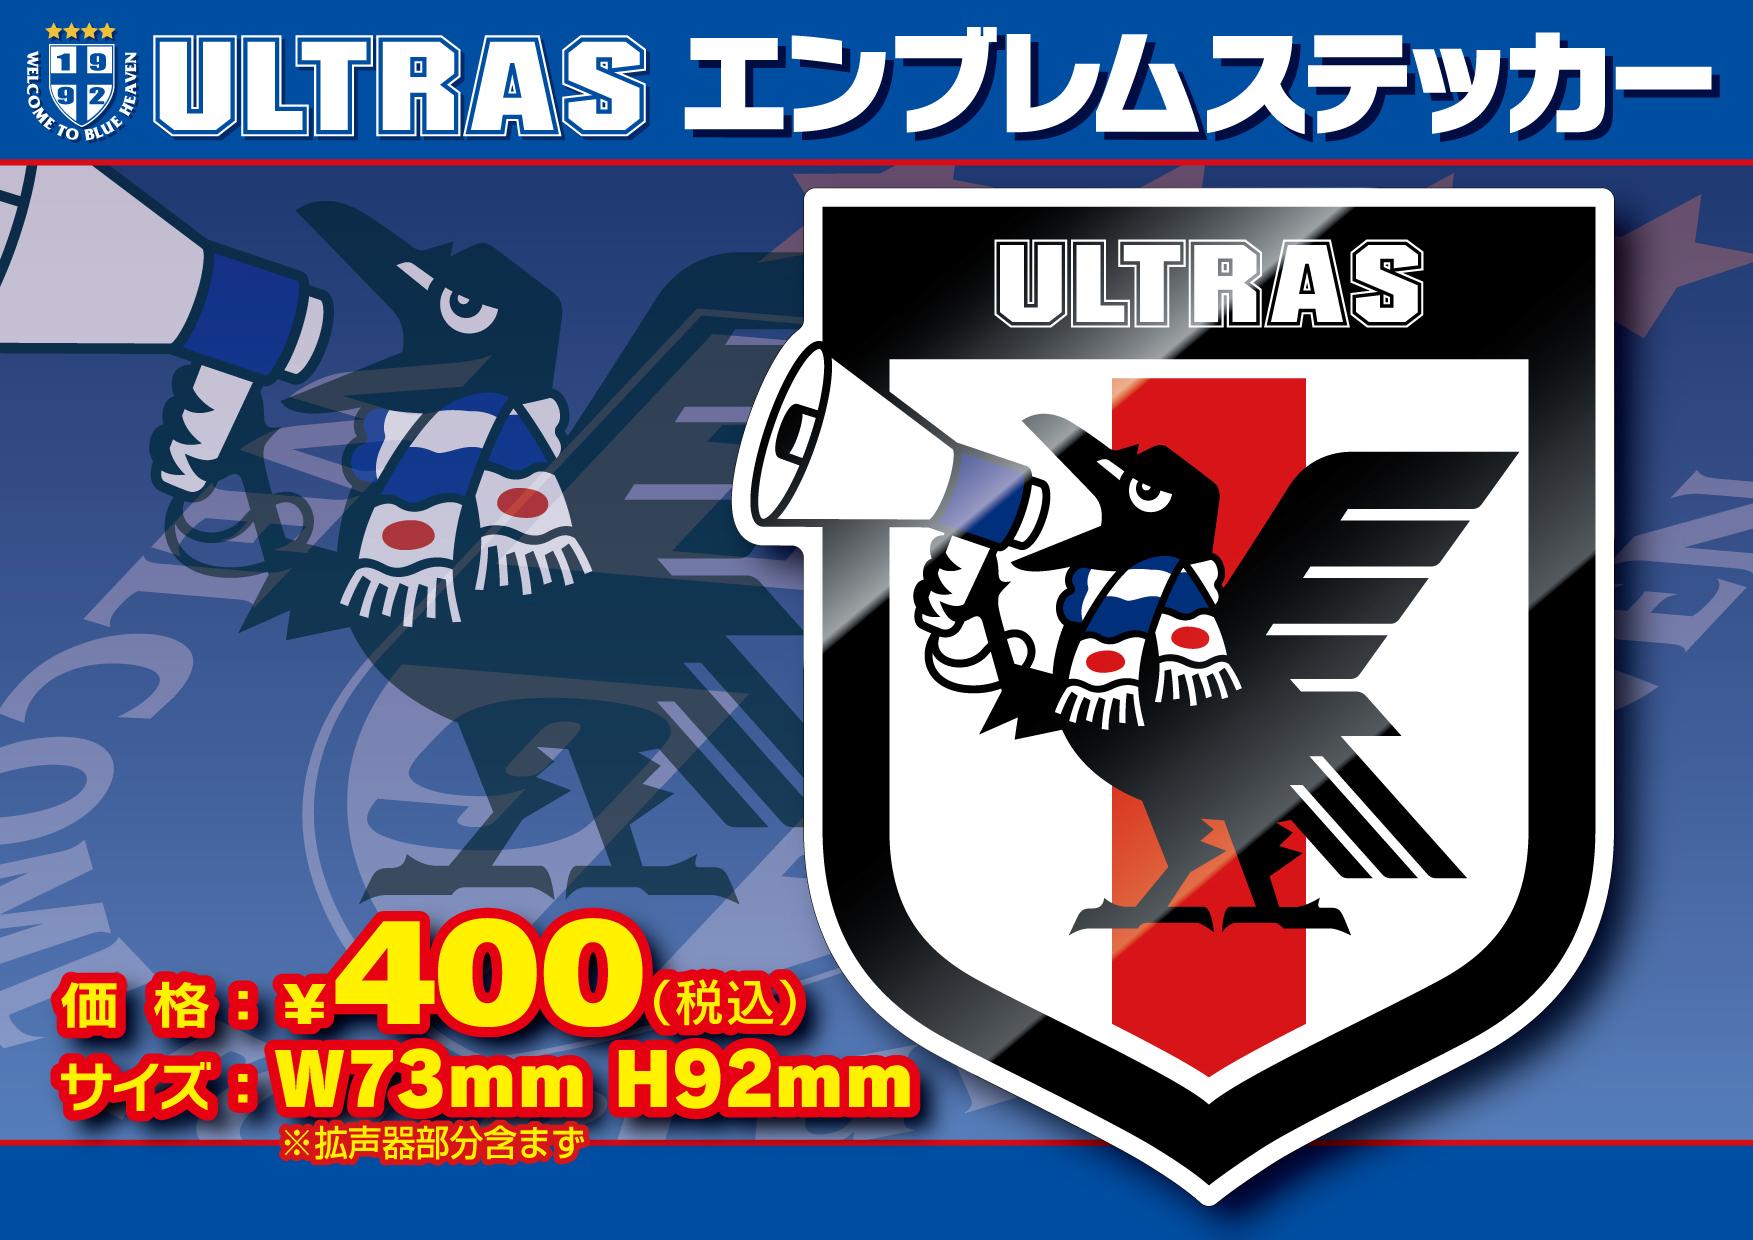 ULTRAS エンブレムステッカー【メール便発送可】